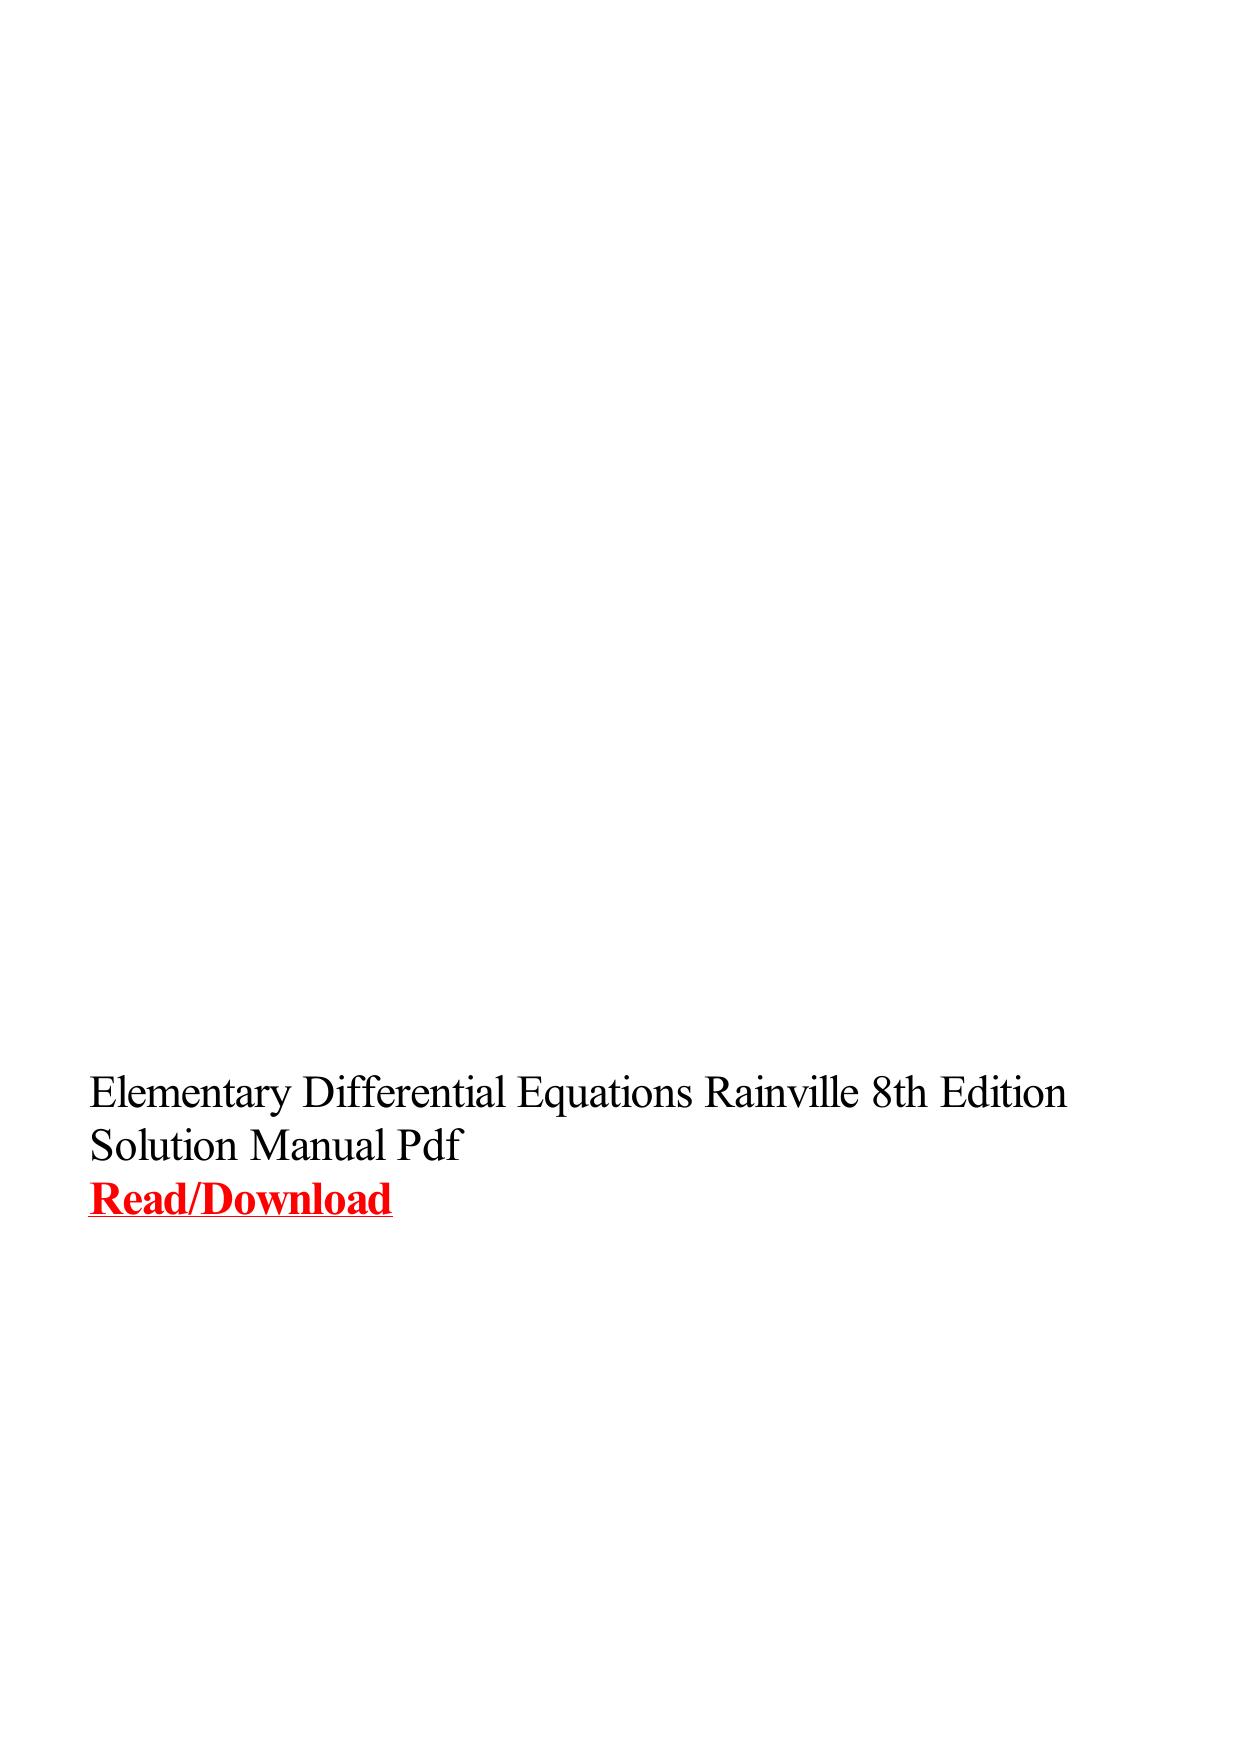 rainville solution manual ebook